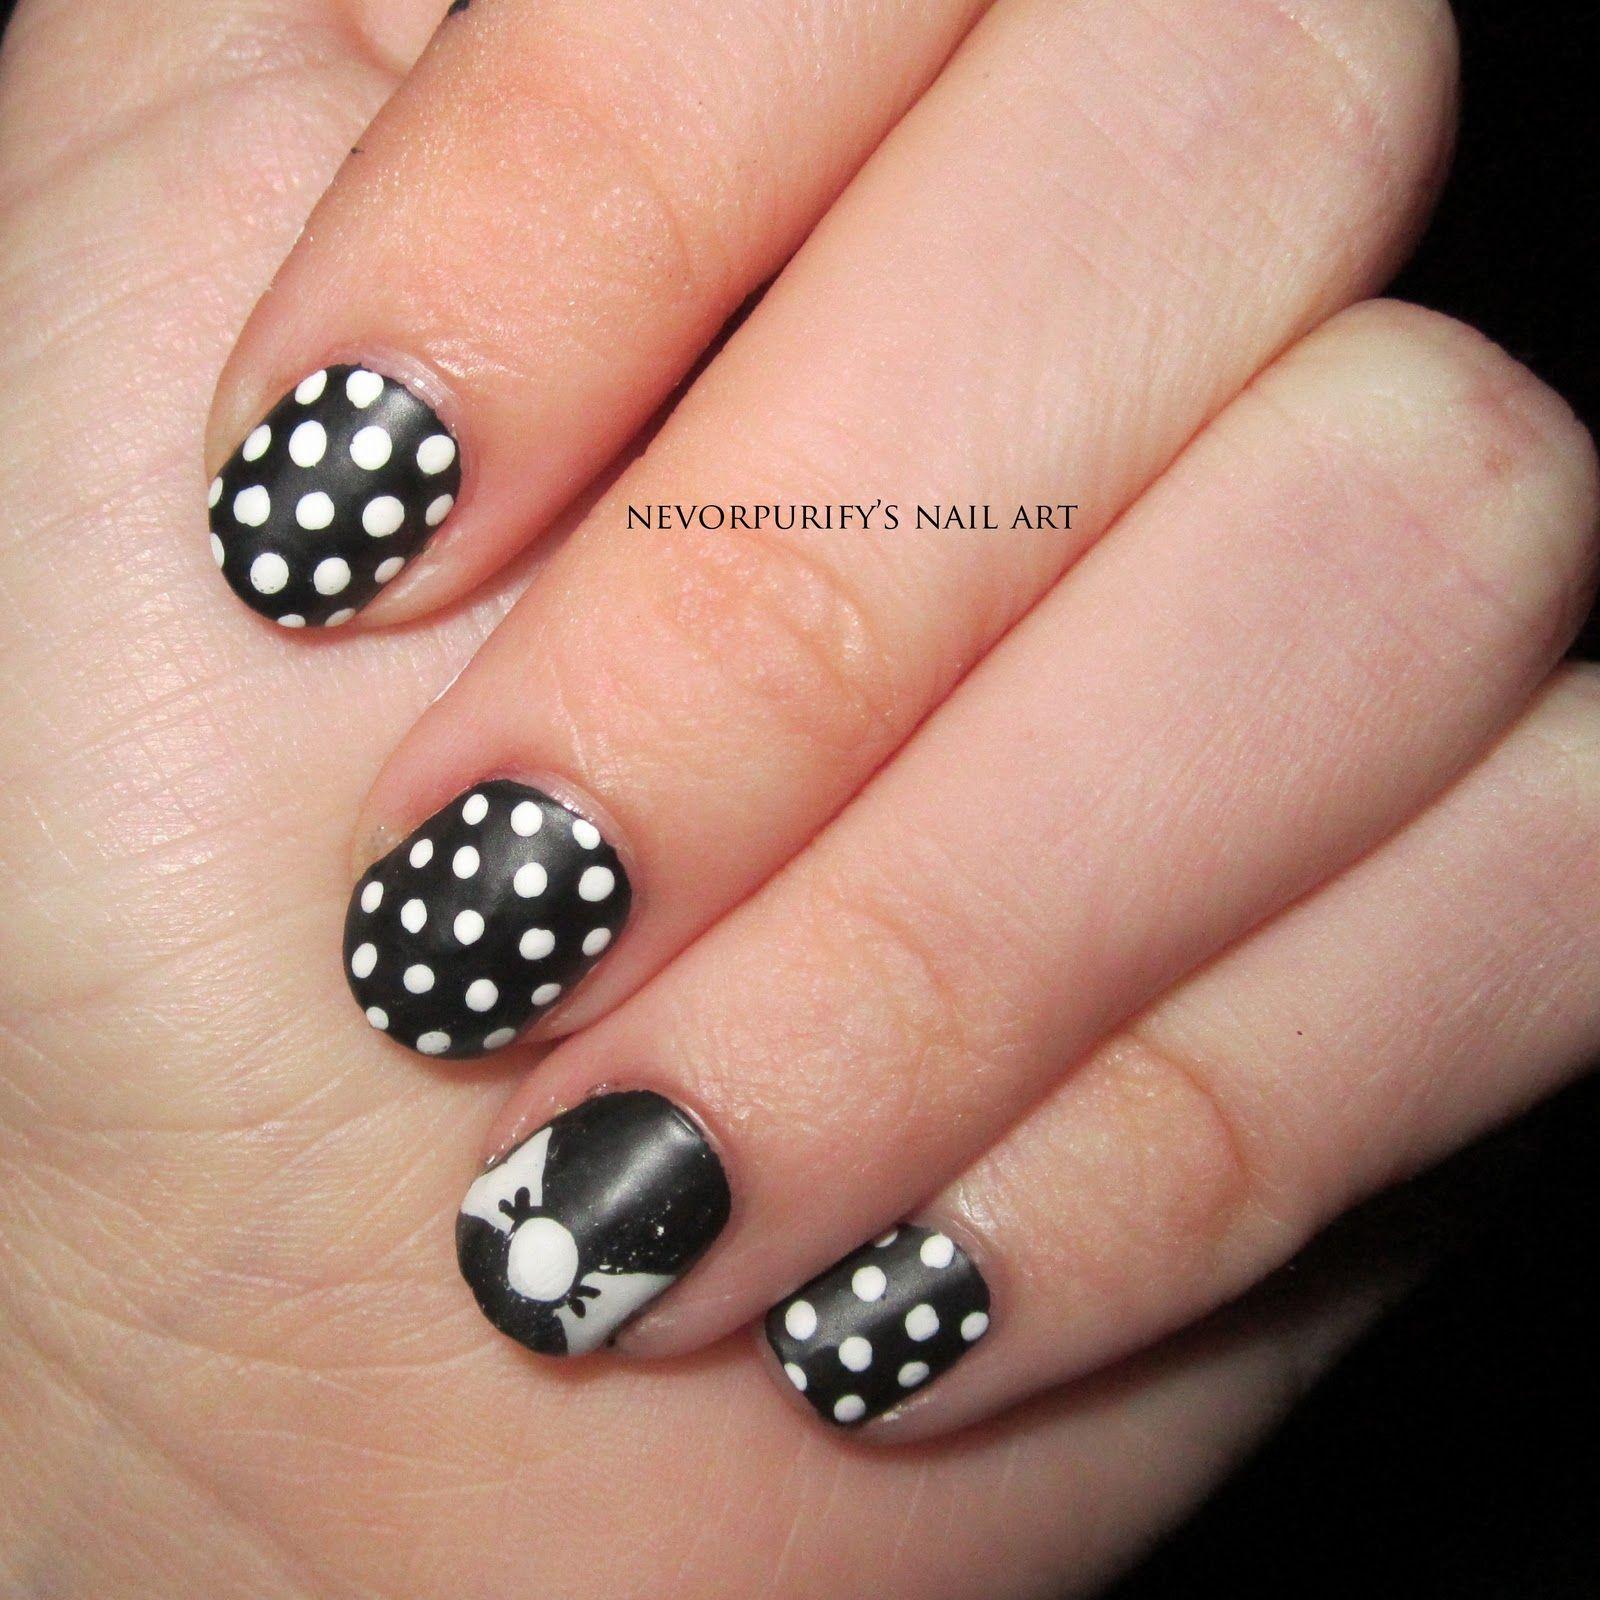 Bows and Polka Dots   Nevorpurify's Nail Art